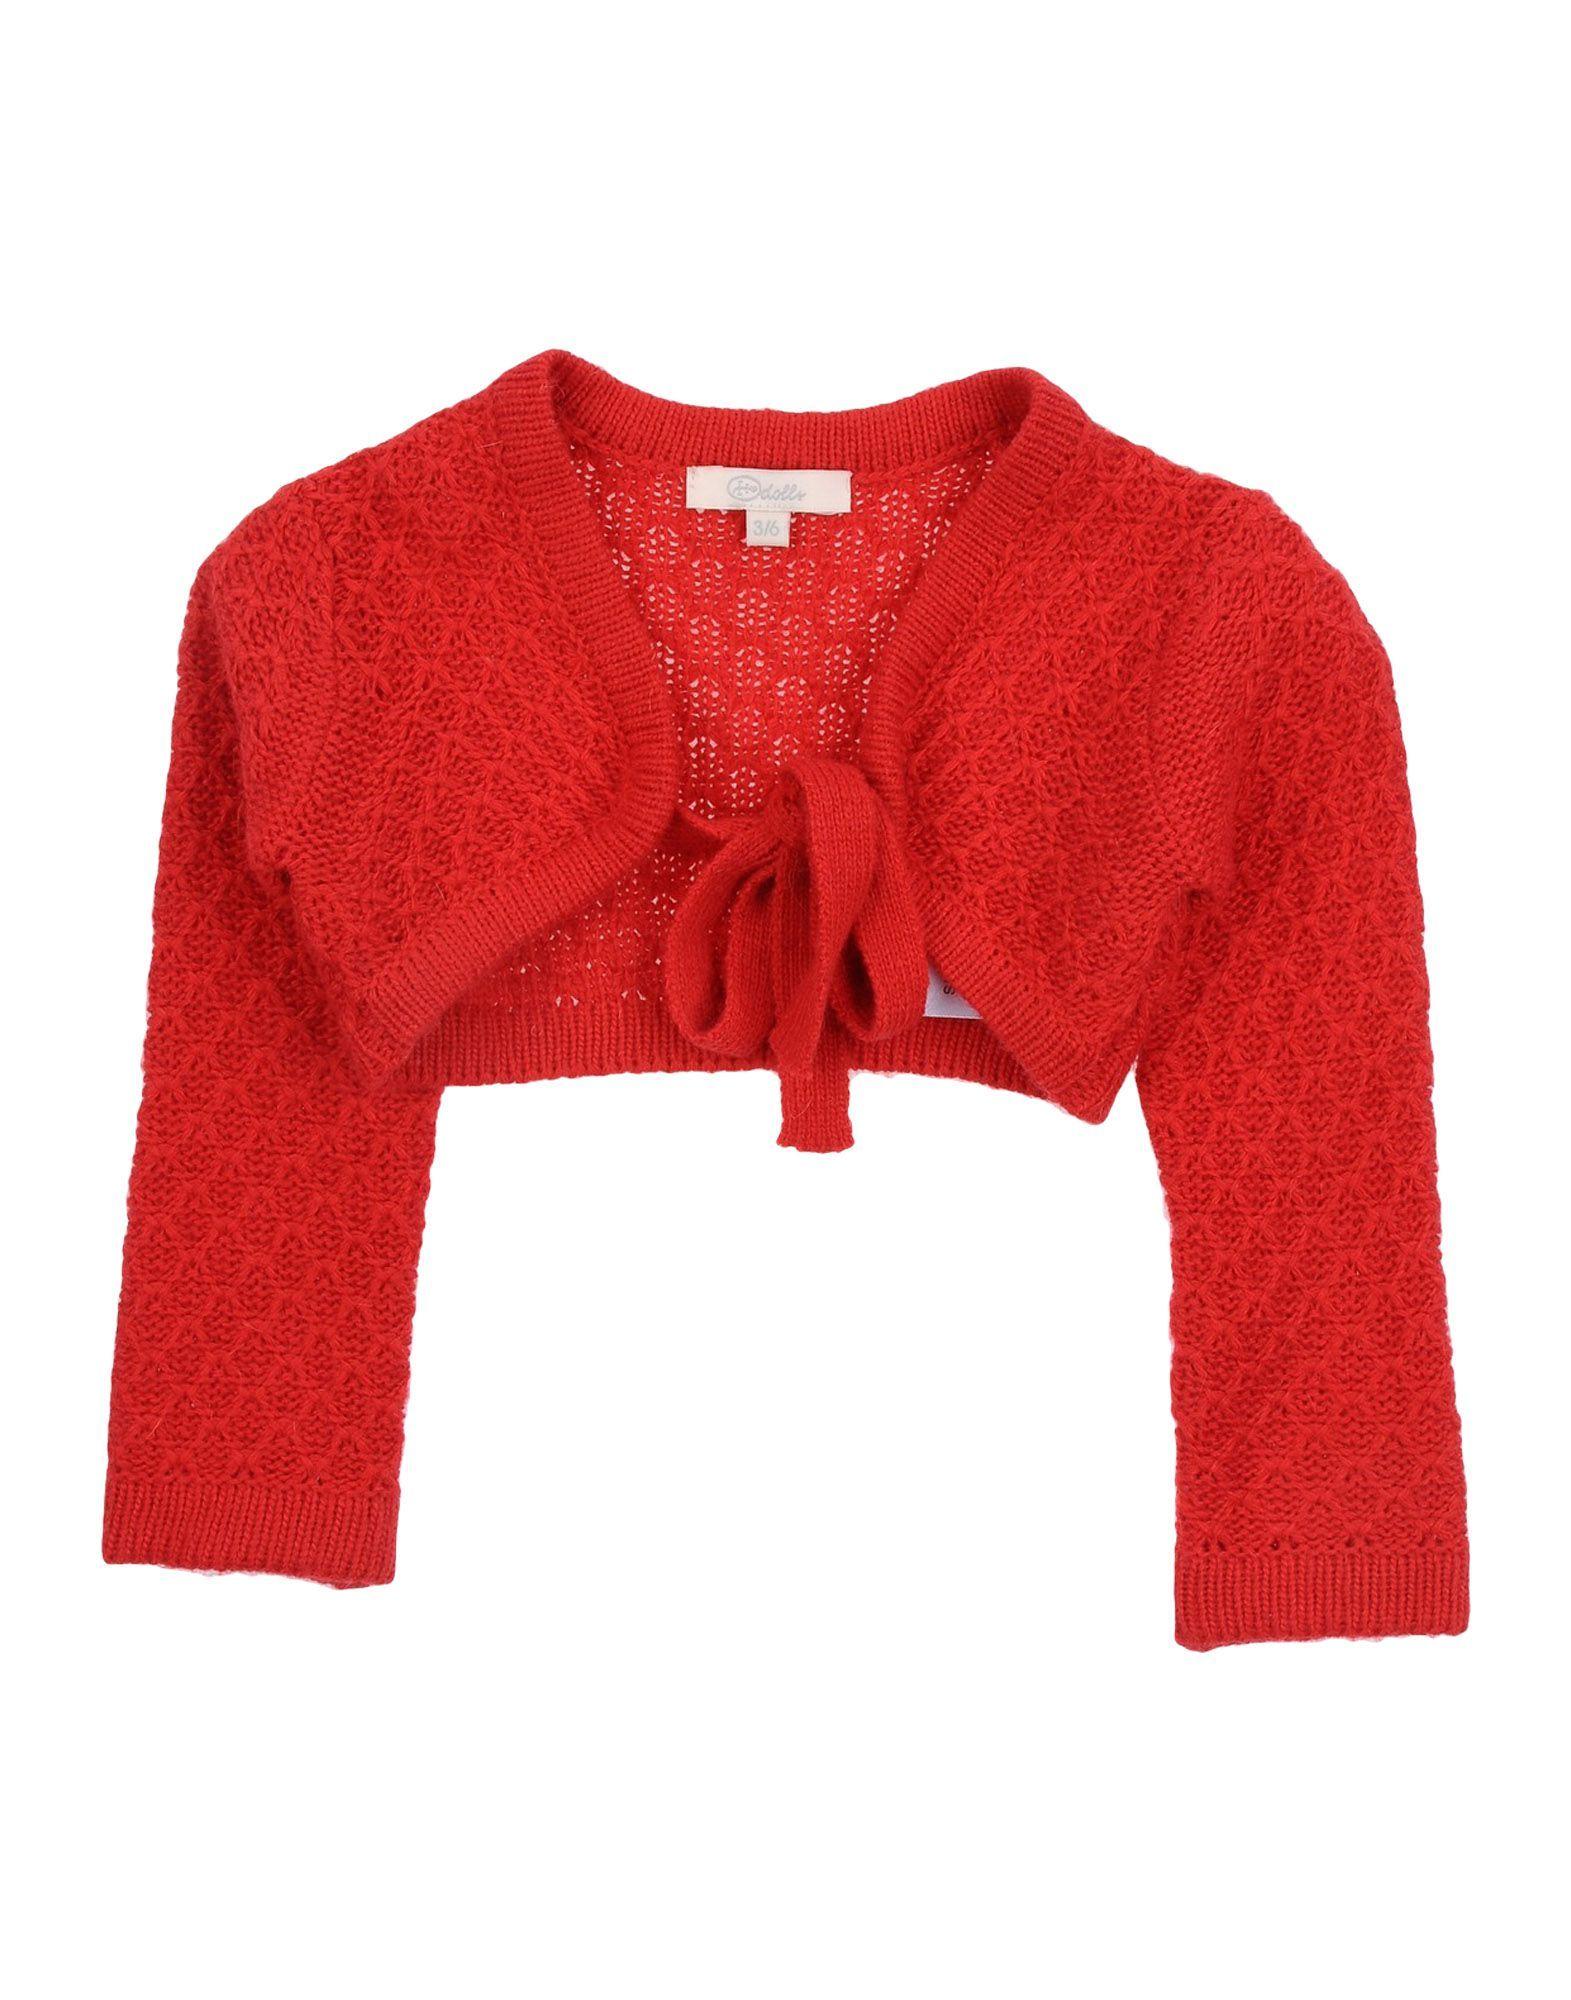 Heach Dolls By Silvian Heach Girl Cardigans Red Nylon